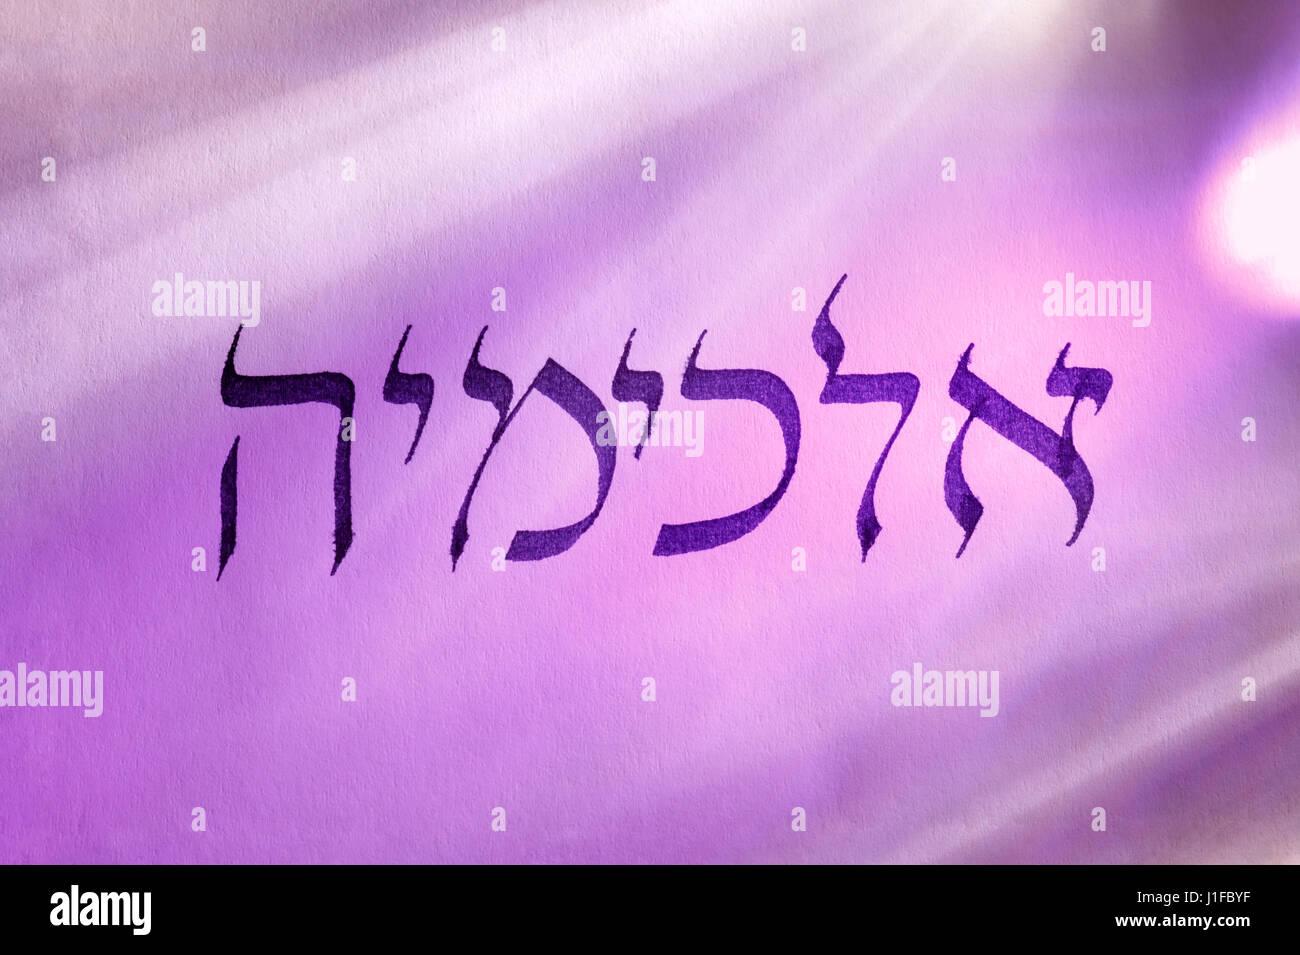 Handwritten word alchemy in hebrew script under colored lights. Hebrew language. - Stock Image